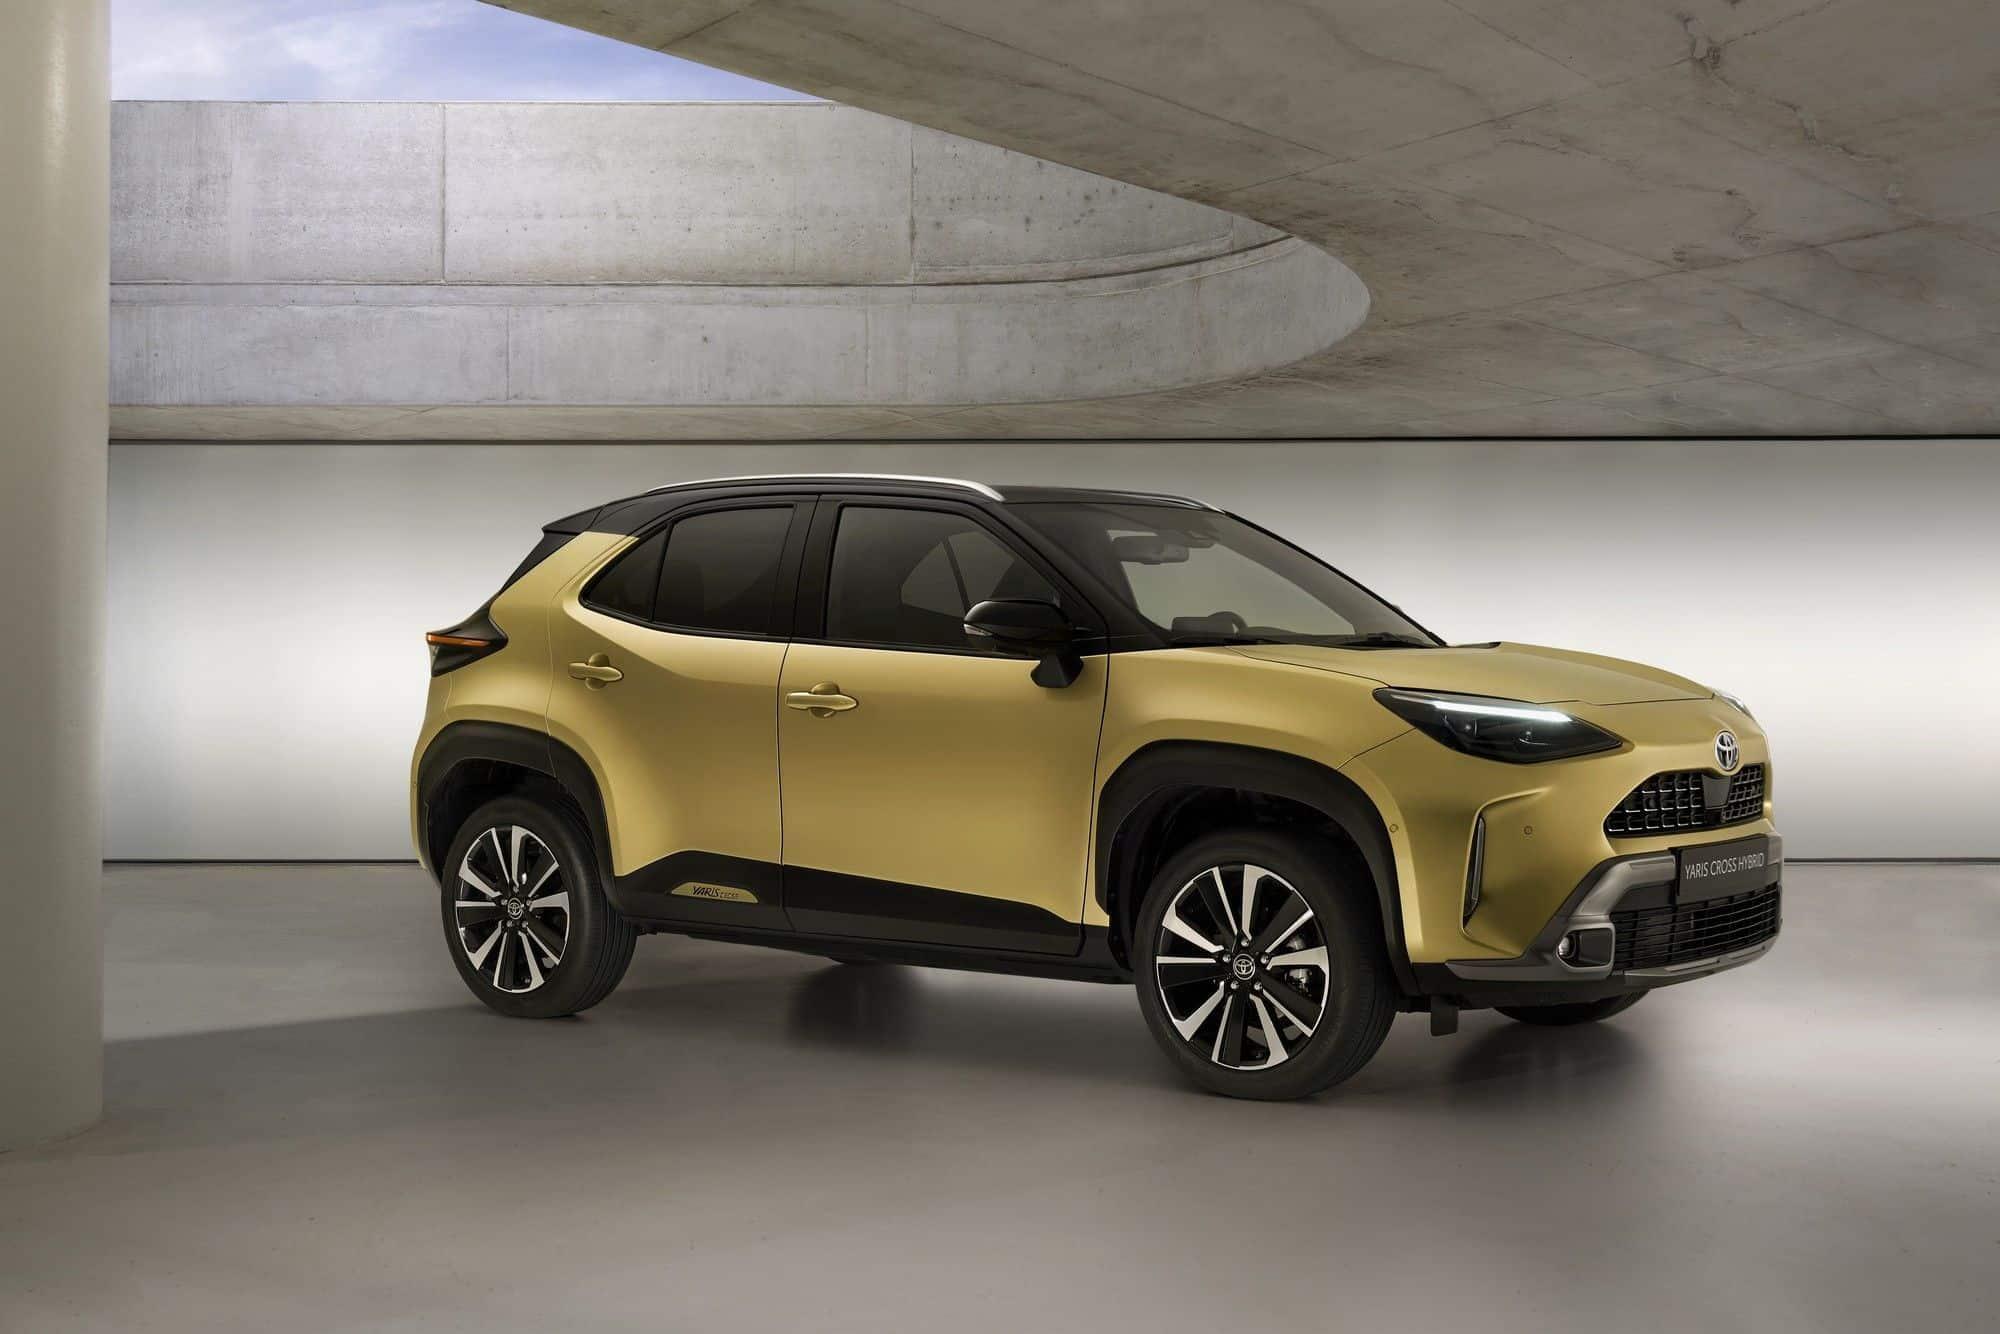 Toyota Yaris Cross Premiere 2021